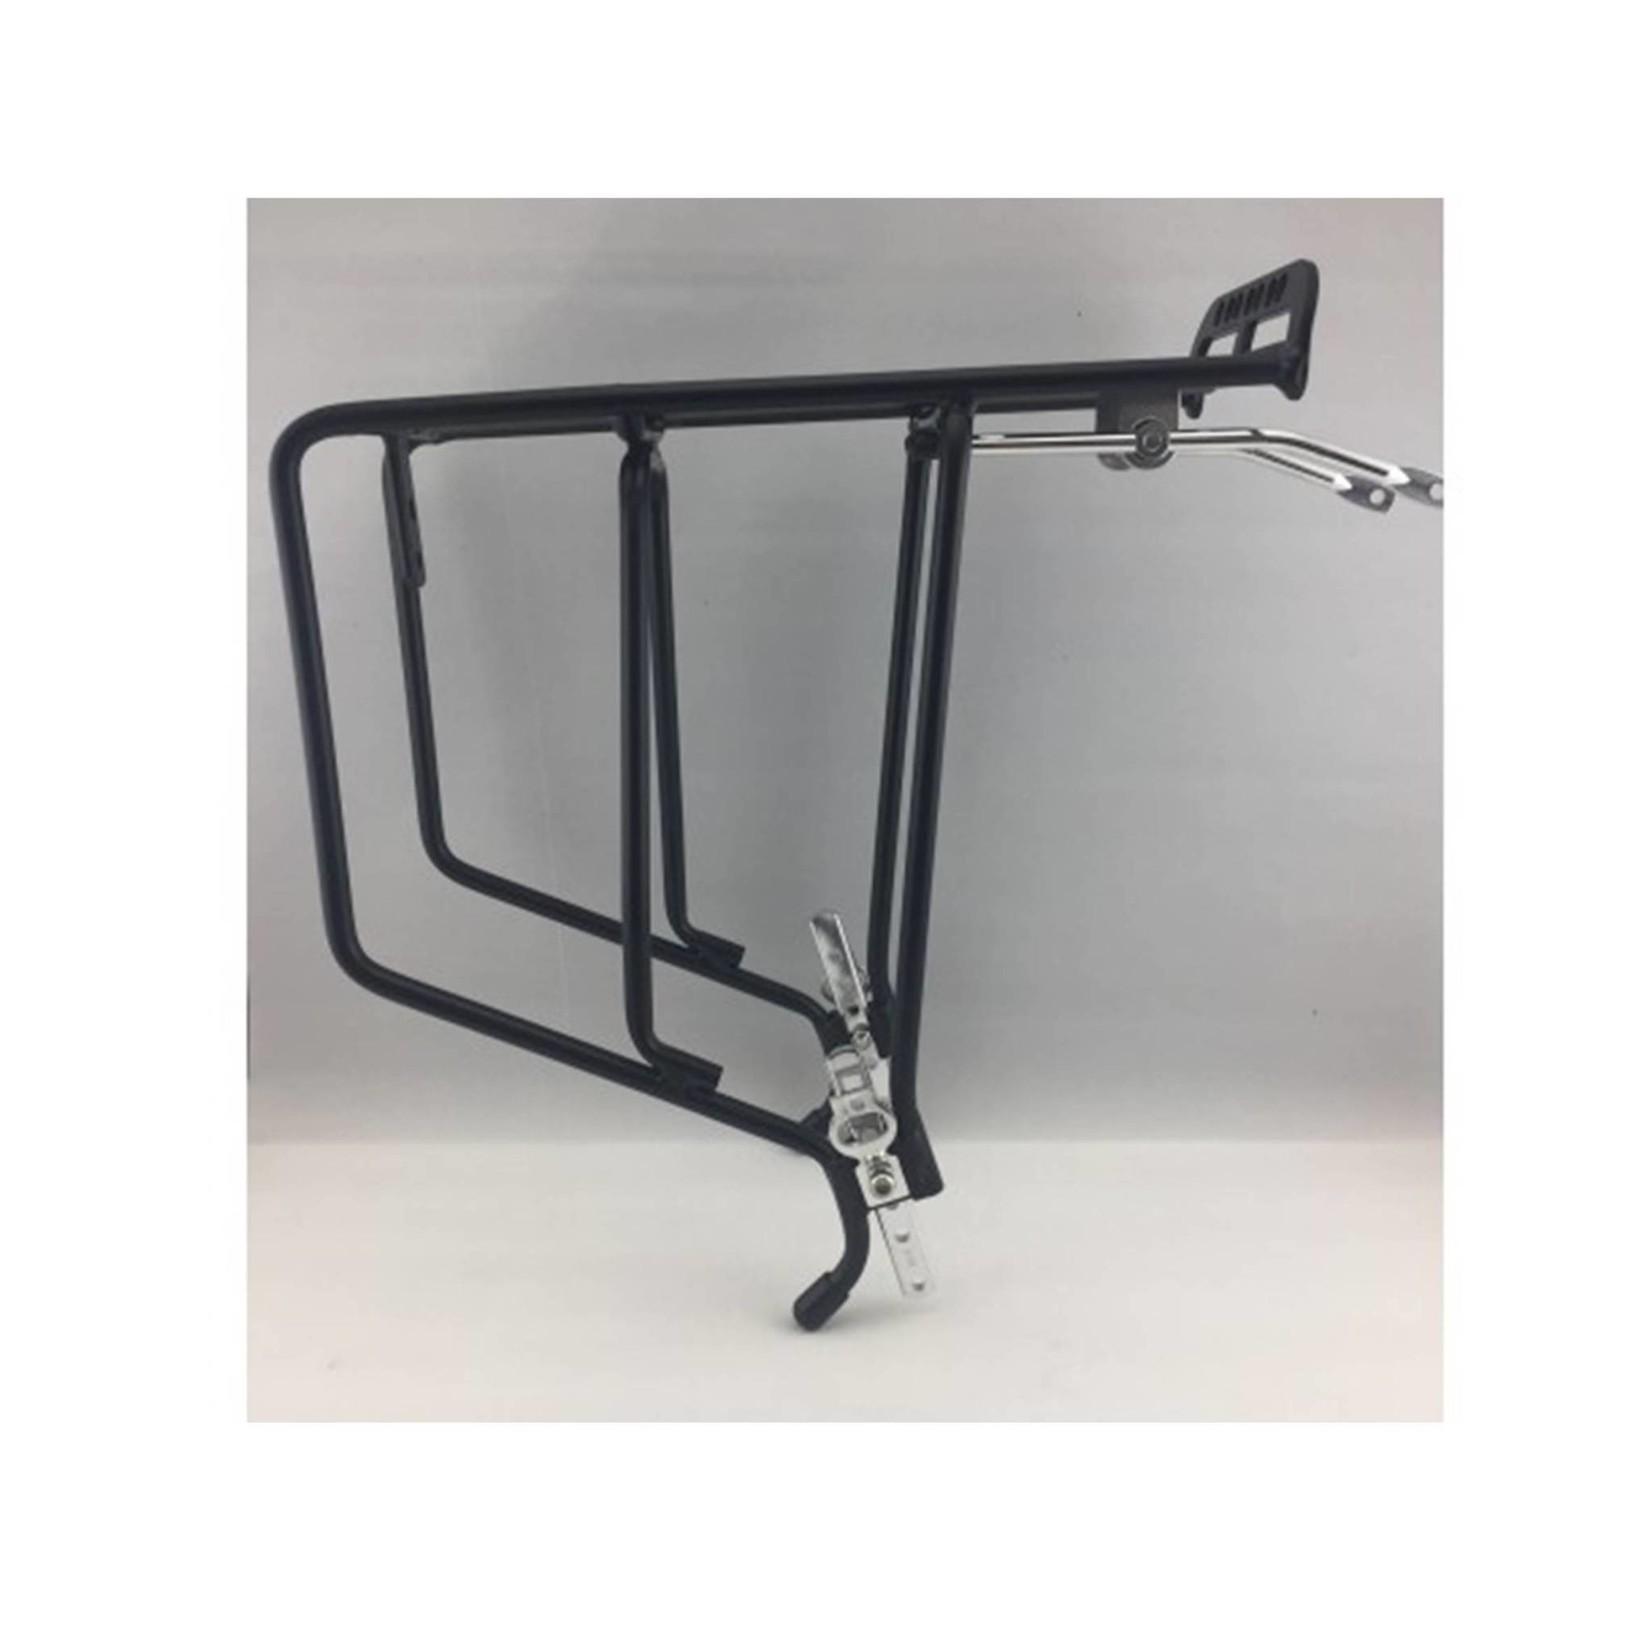 Maxx Pro Adjustable Alloy Pannier Rack